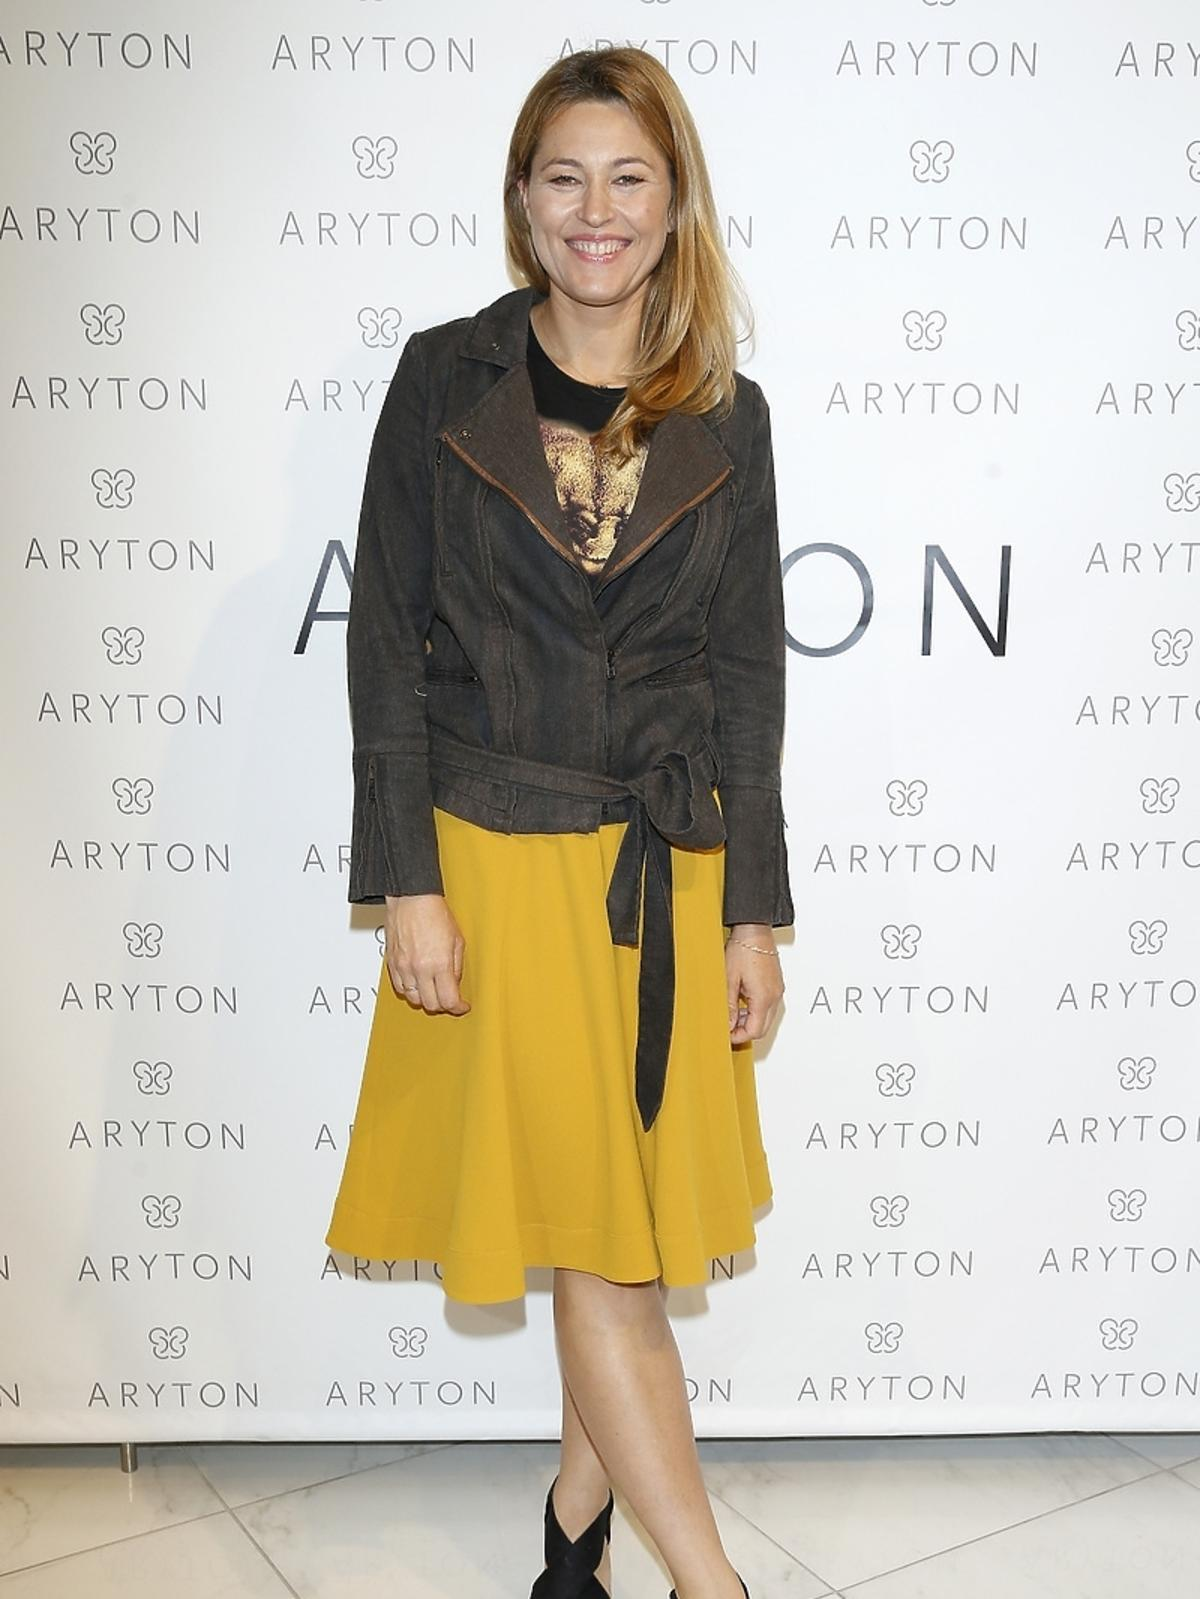 Beata Sadowska na pokazie nowej kolekcji marki Aryton